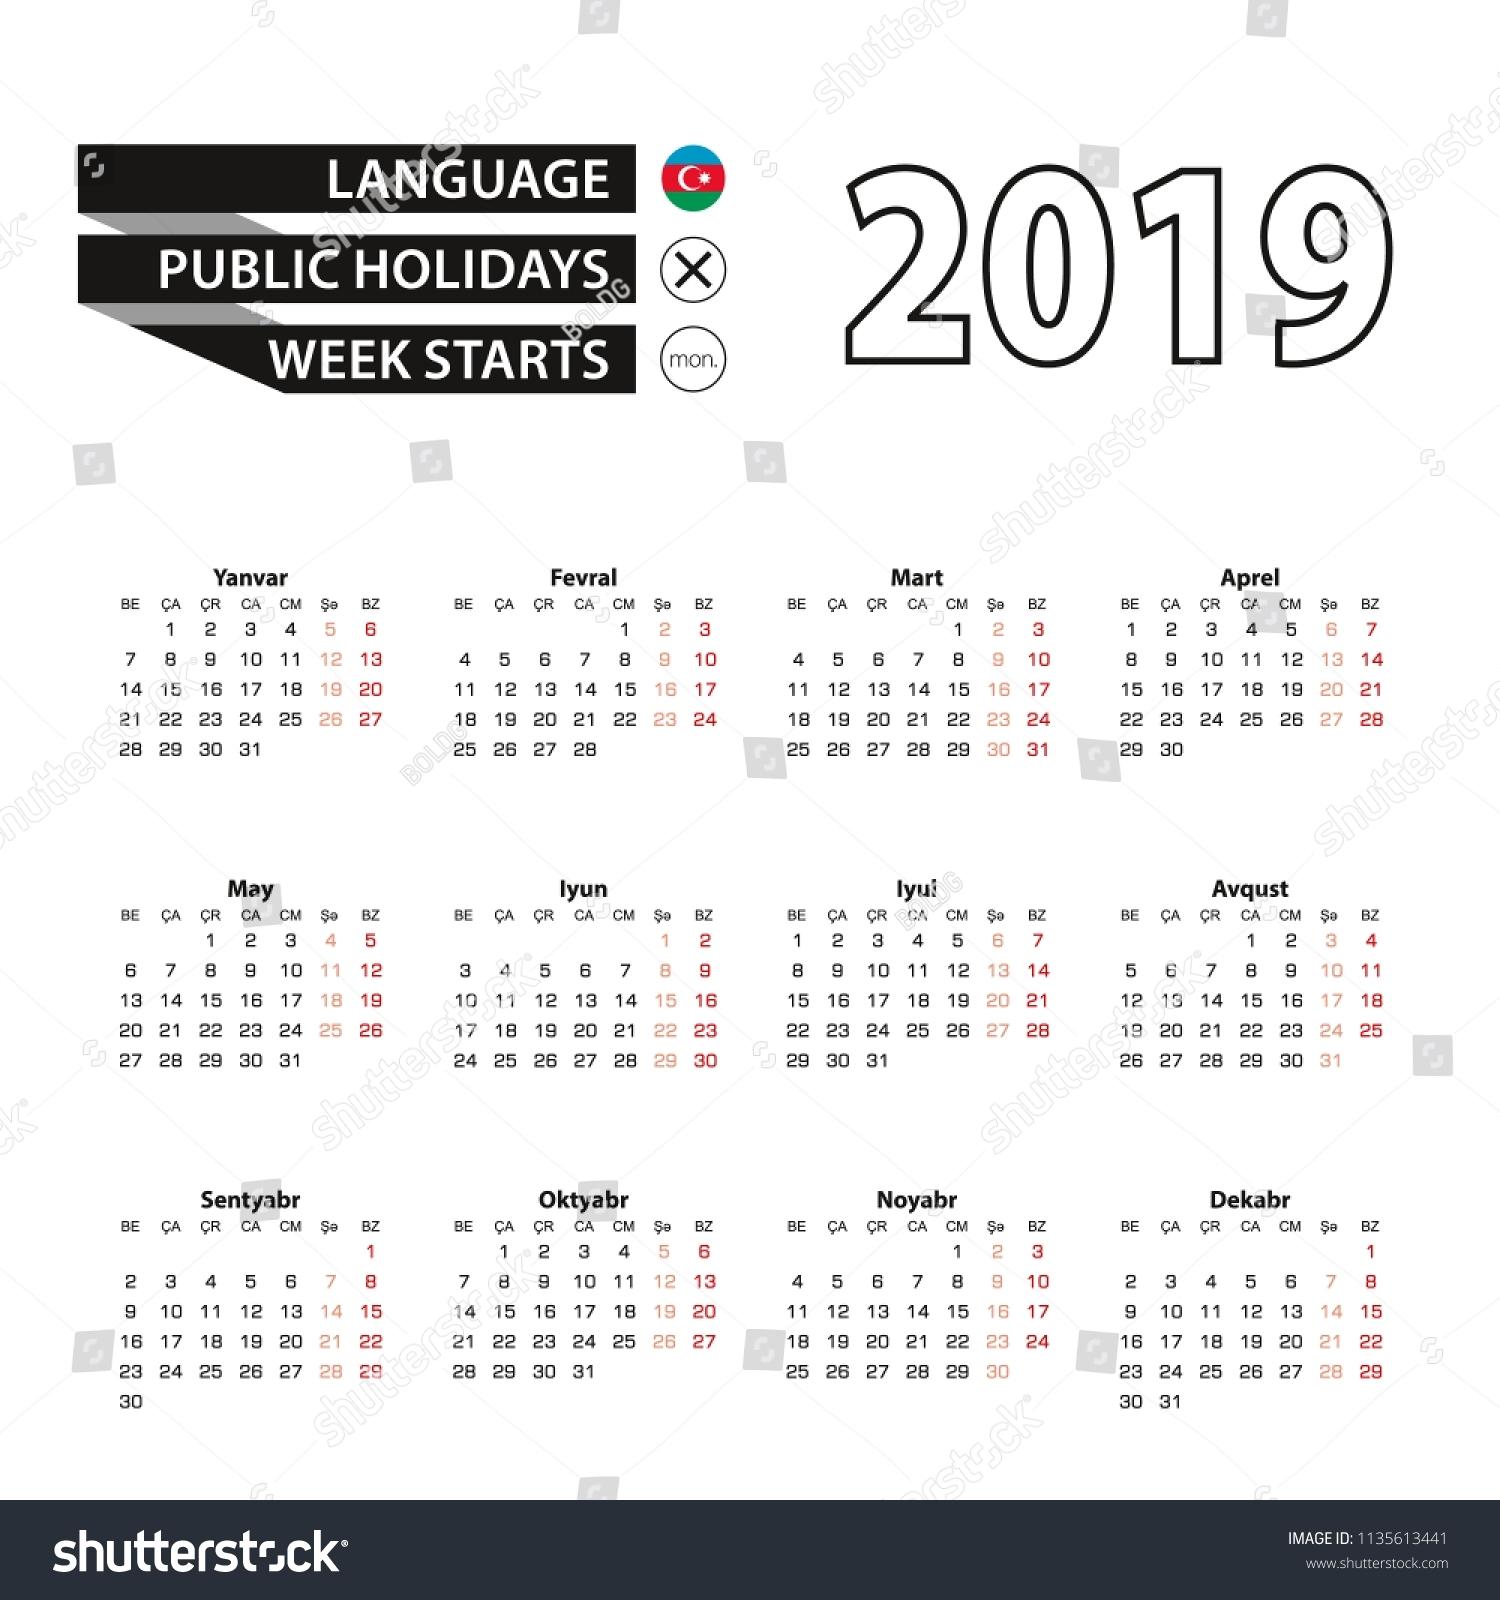 Calendar 2019 Azerbaijani Language Week Starts Stock Vector